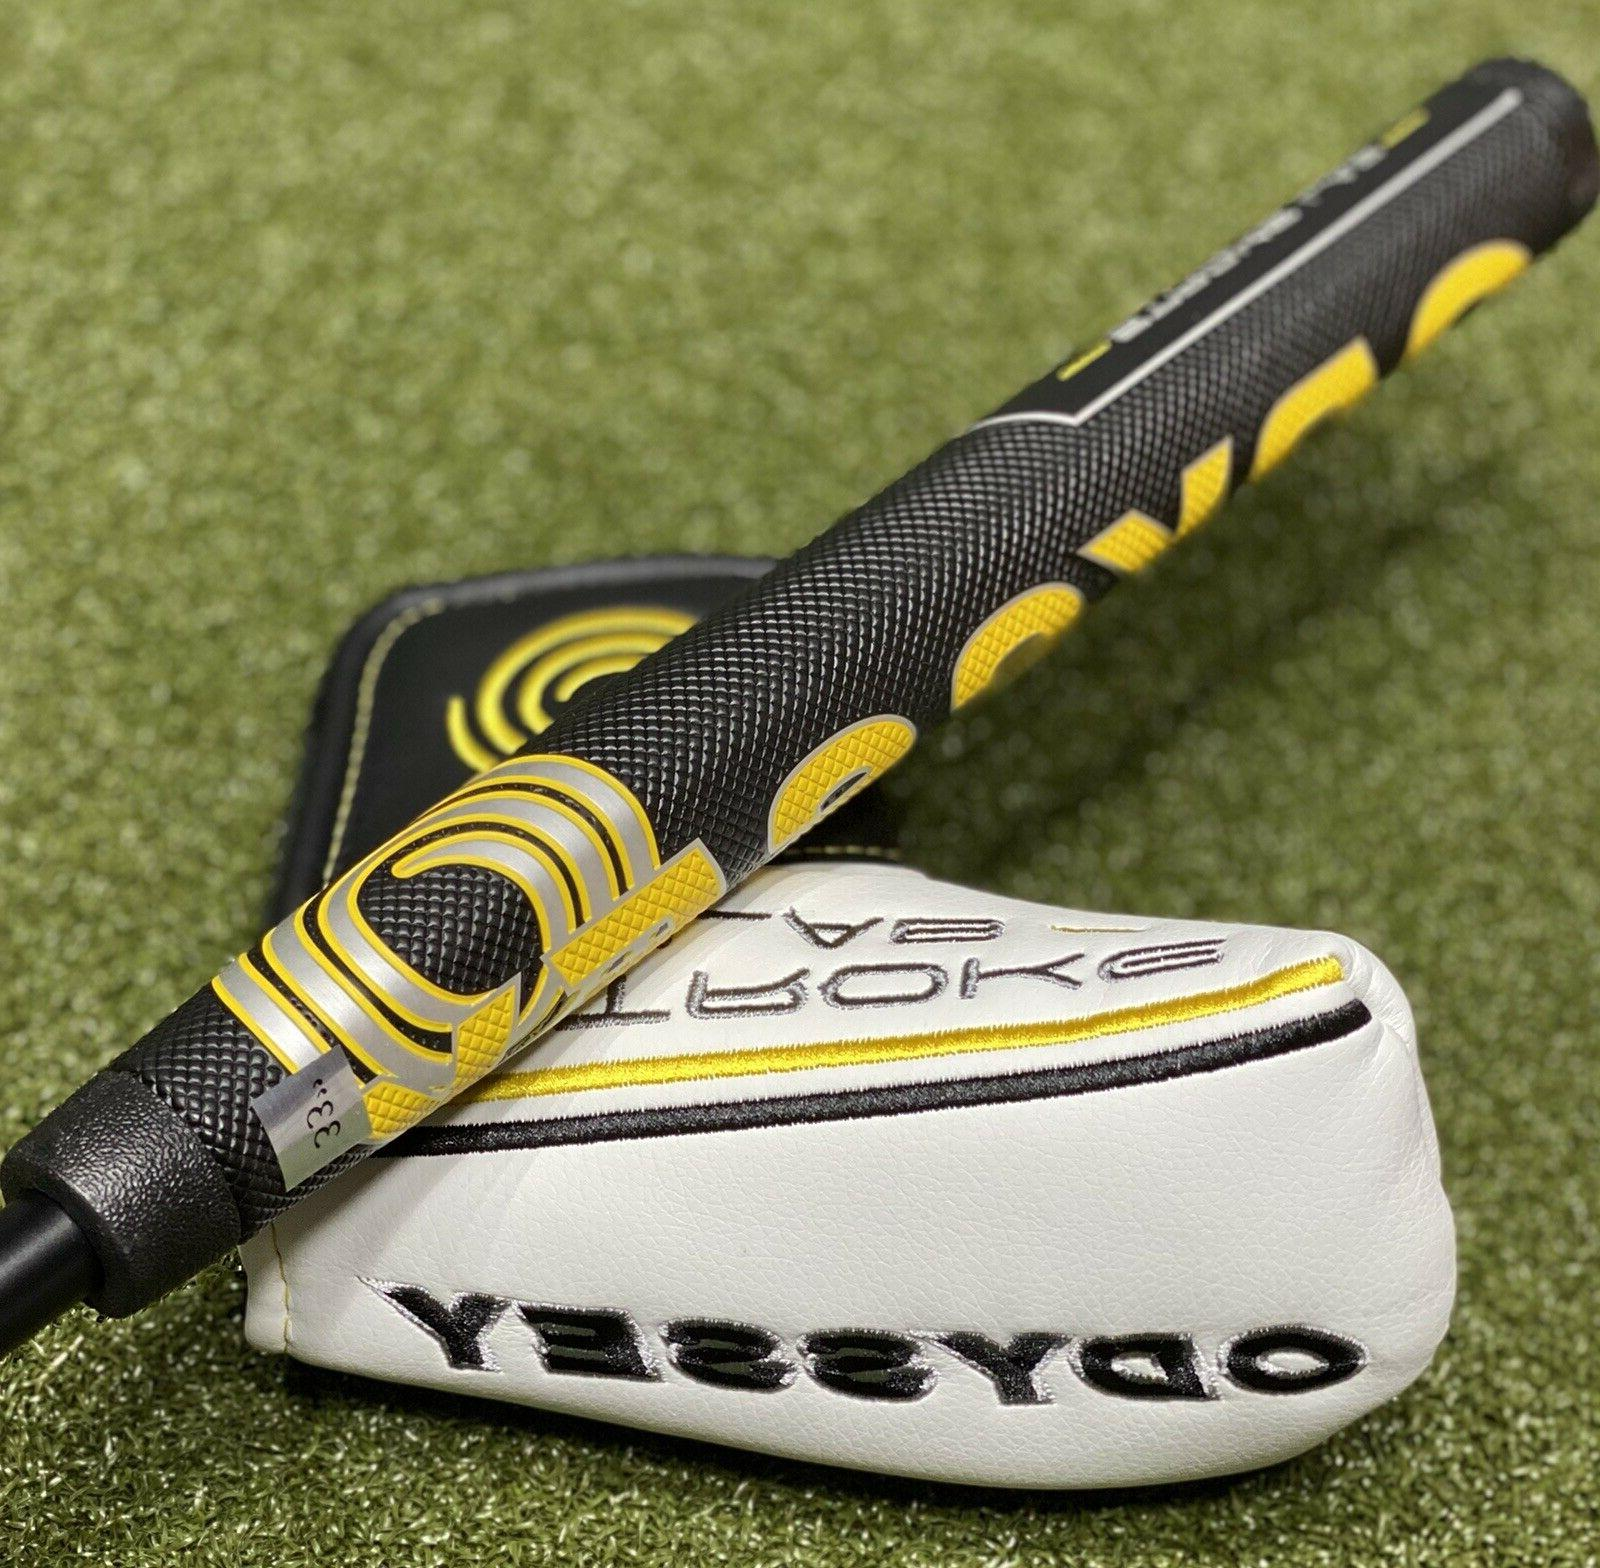 Odyssey Stroke Double Putter Oversize Grip + NEW